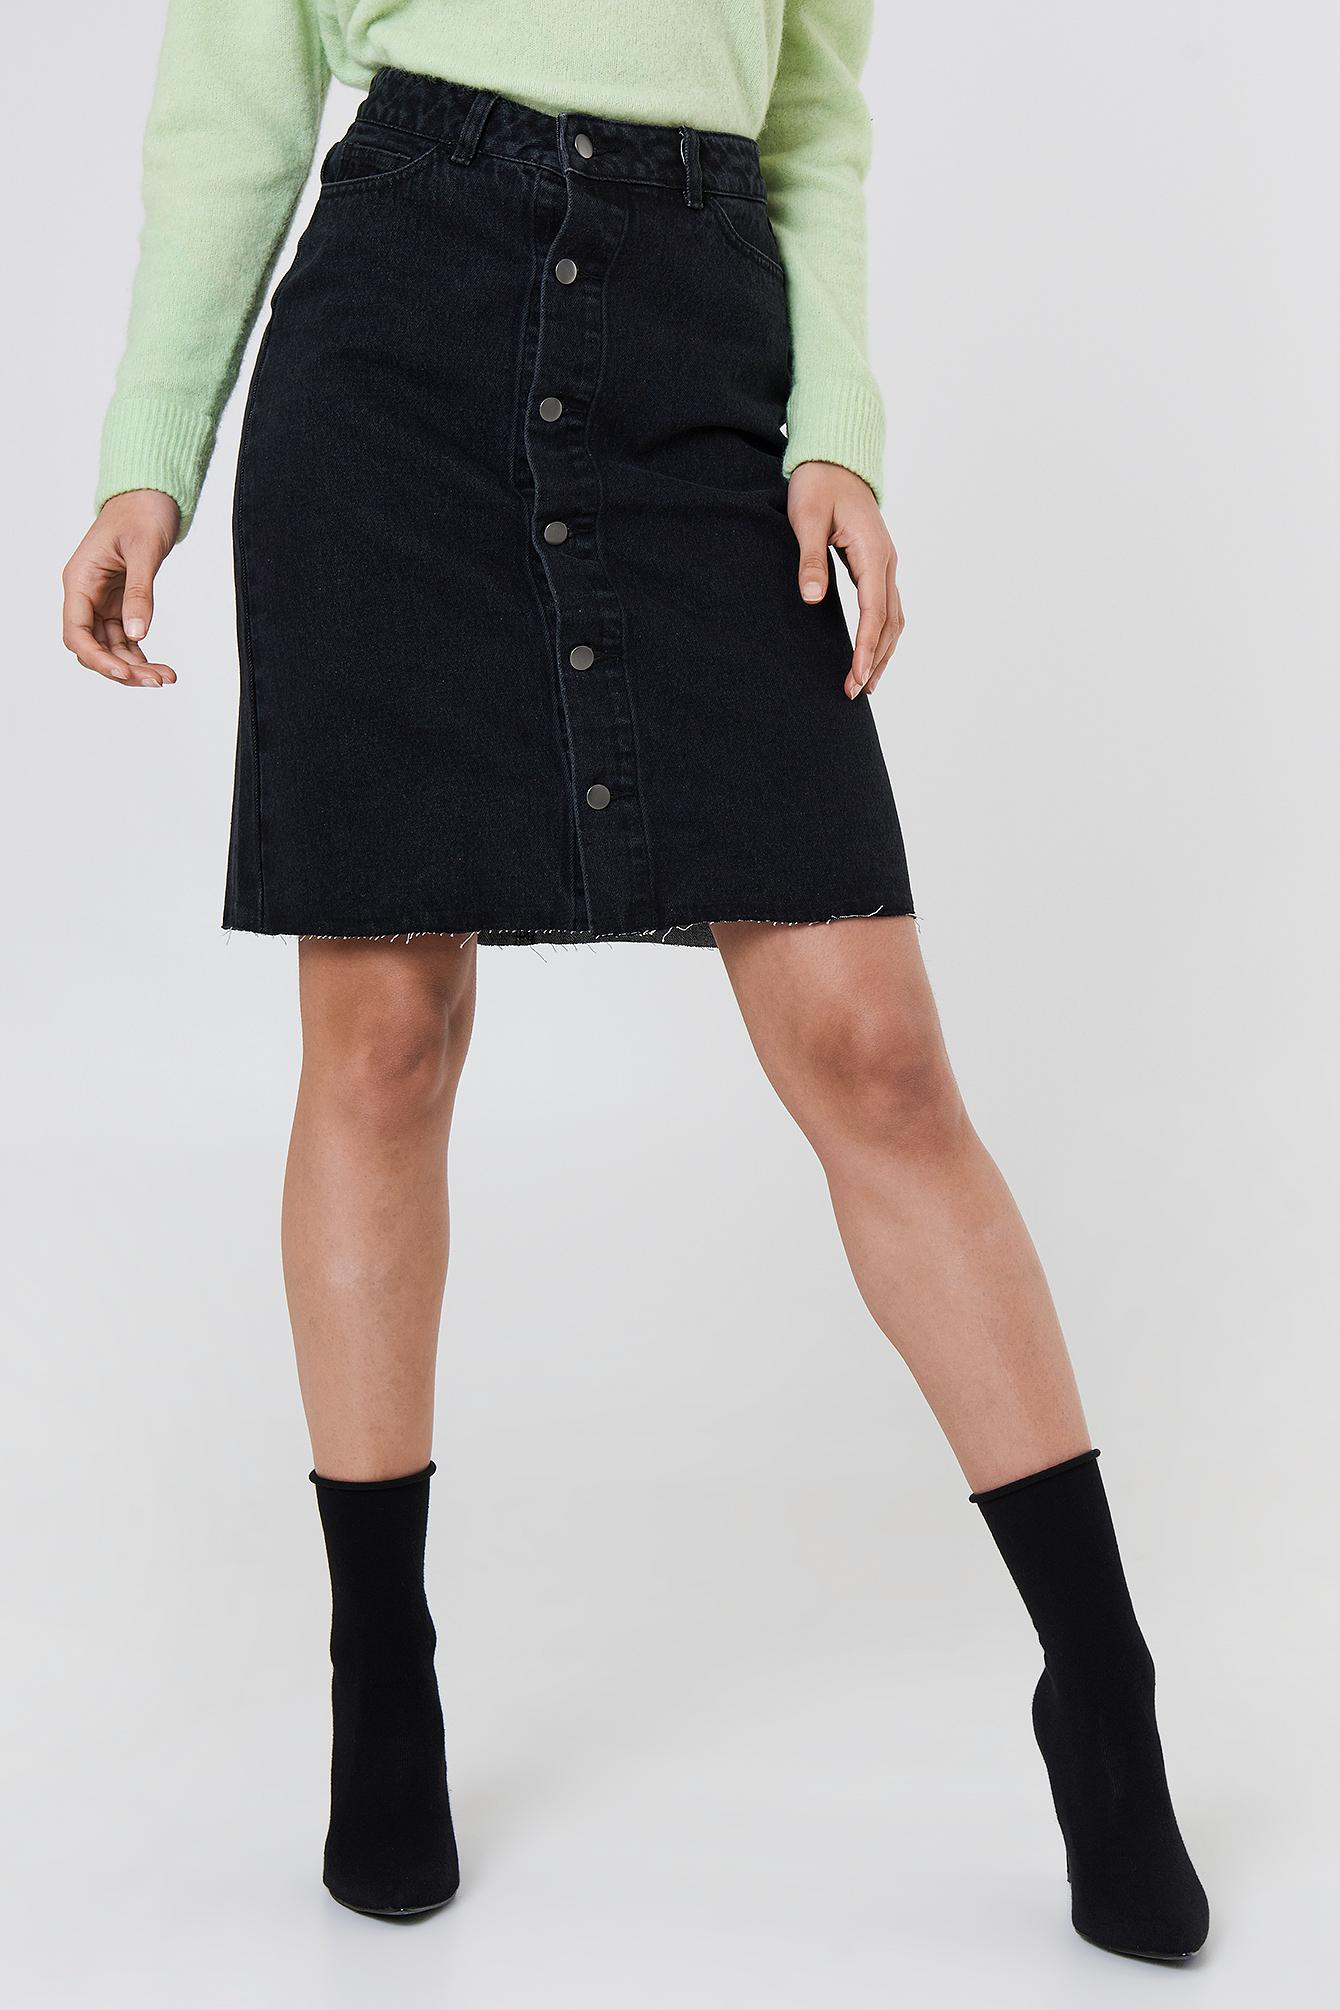 789b556fc NA-KD - Button Up Long Denim Skirt Black - Lyst. View fullscreen